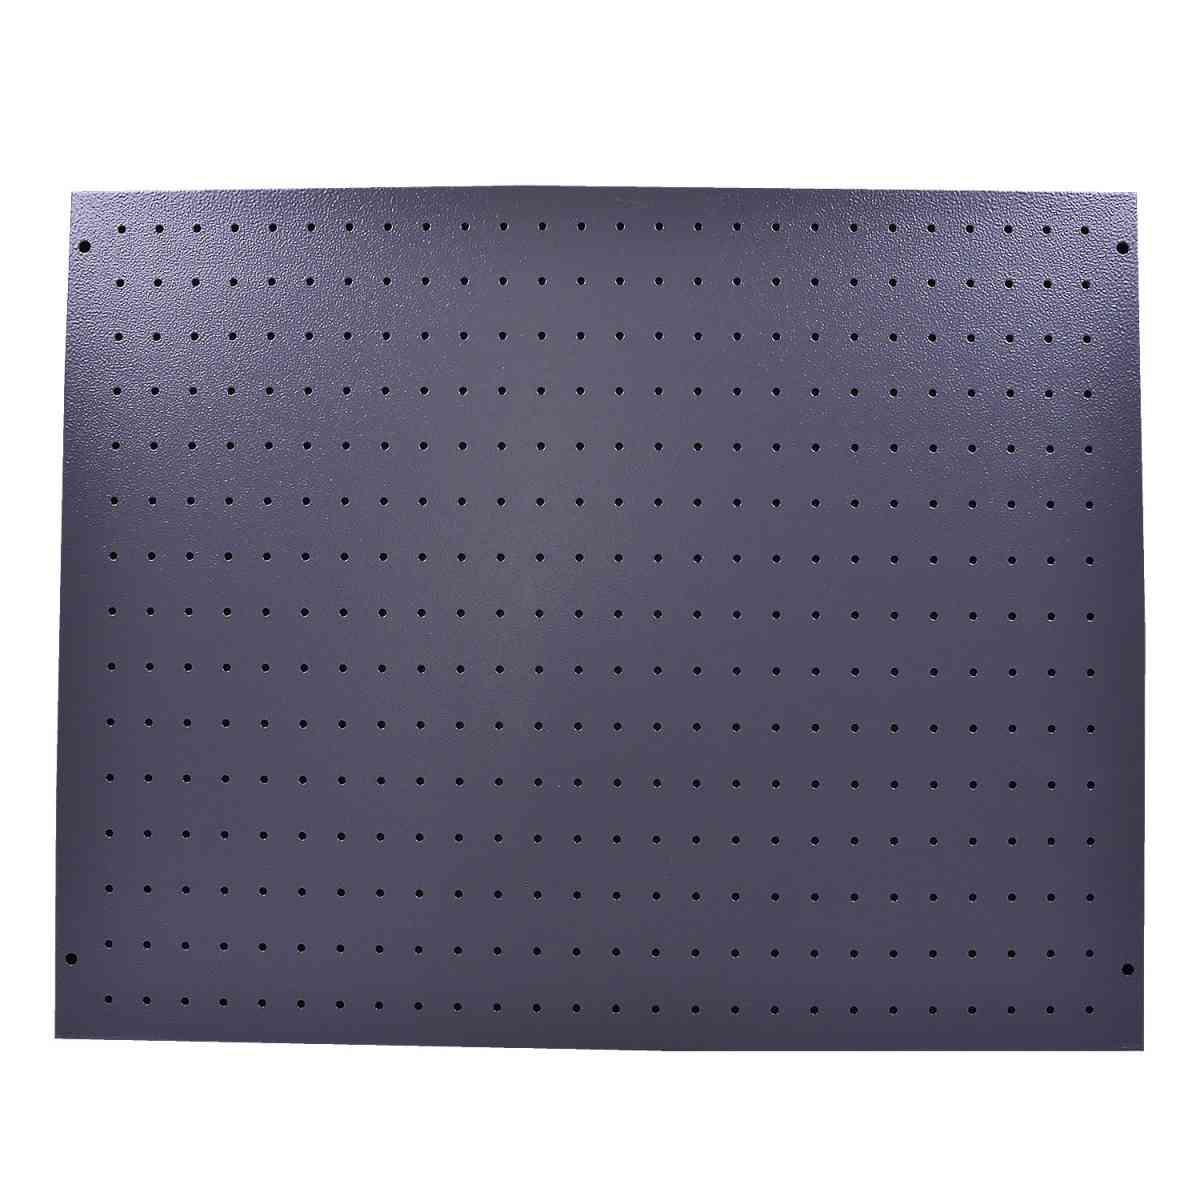 Painel Perfurado Para Ferramentas 725X575mm 40401 Presto